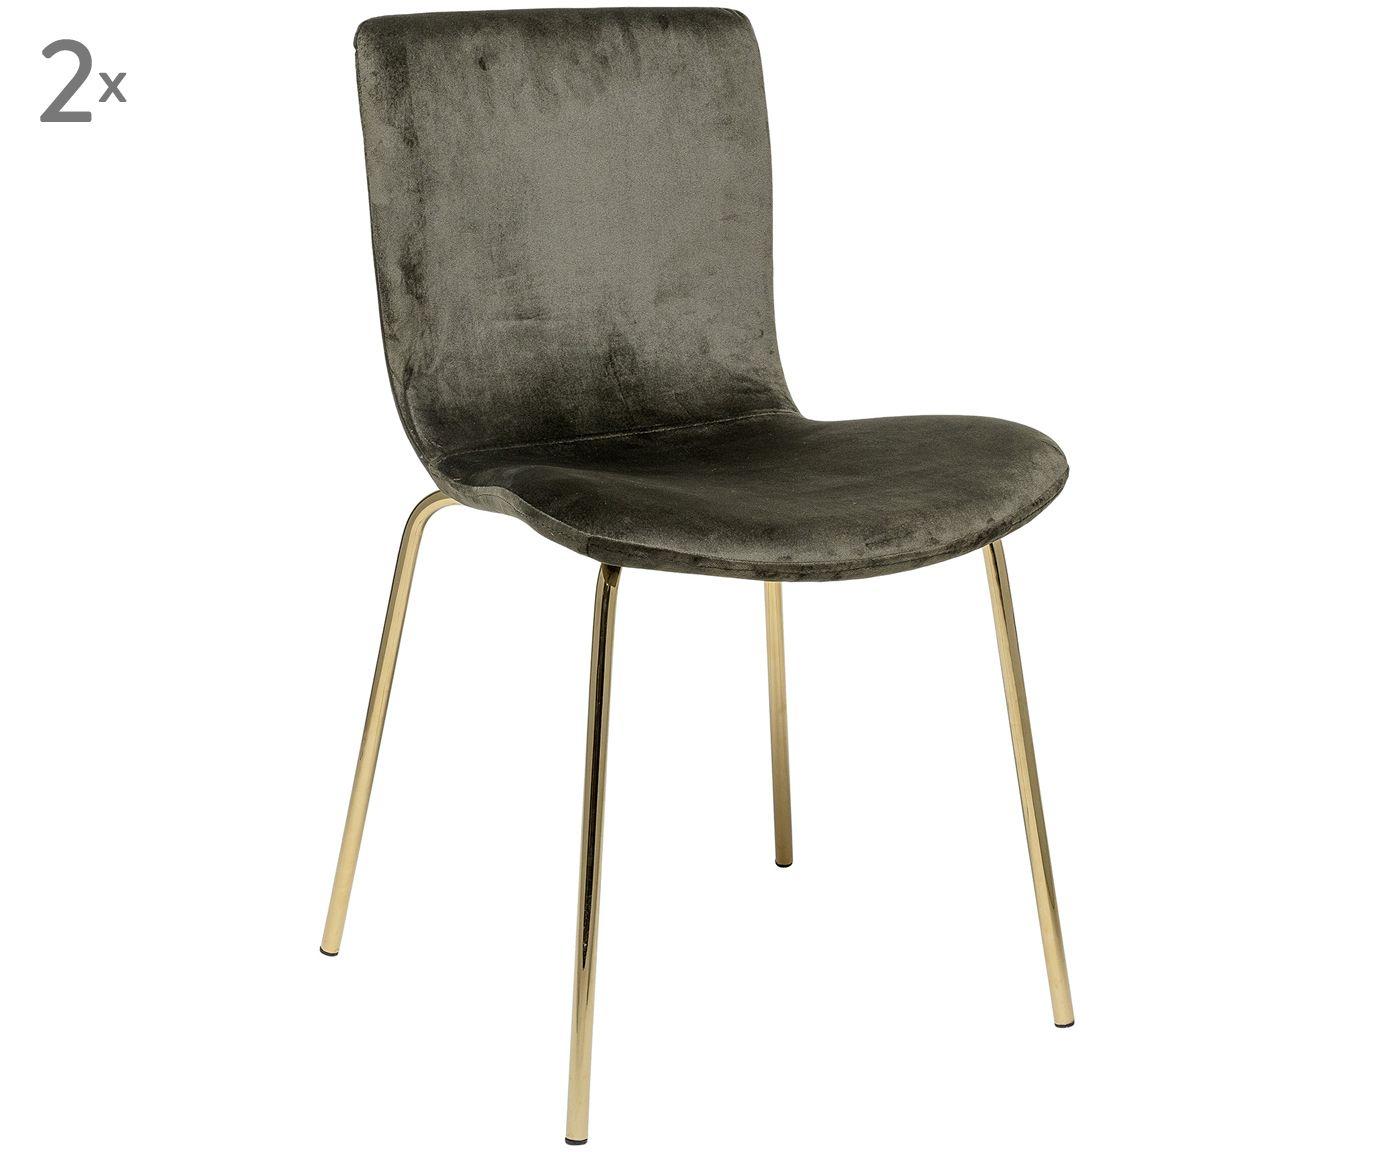 Polsterstuhl Samt Olivengrun Stuhl Samt Esszimmer Kuche Design Designstuhl Gold Green Interior Interieur Polsterstuhl Polster Stuhle